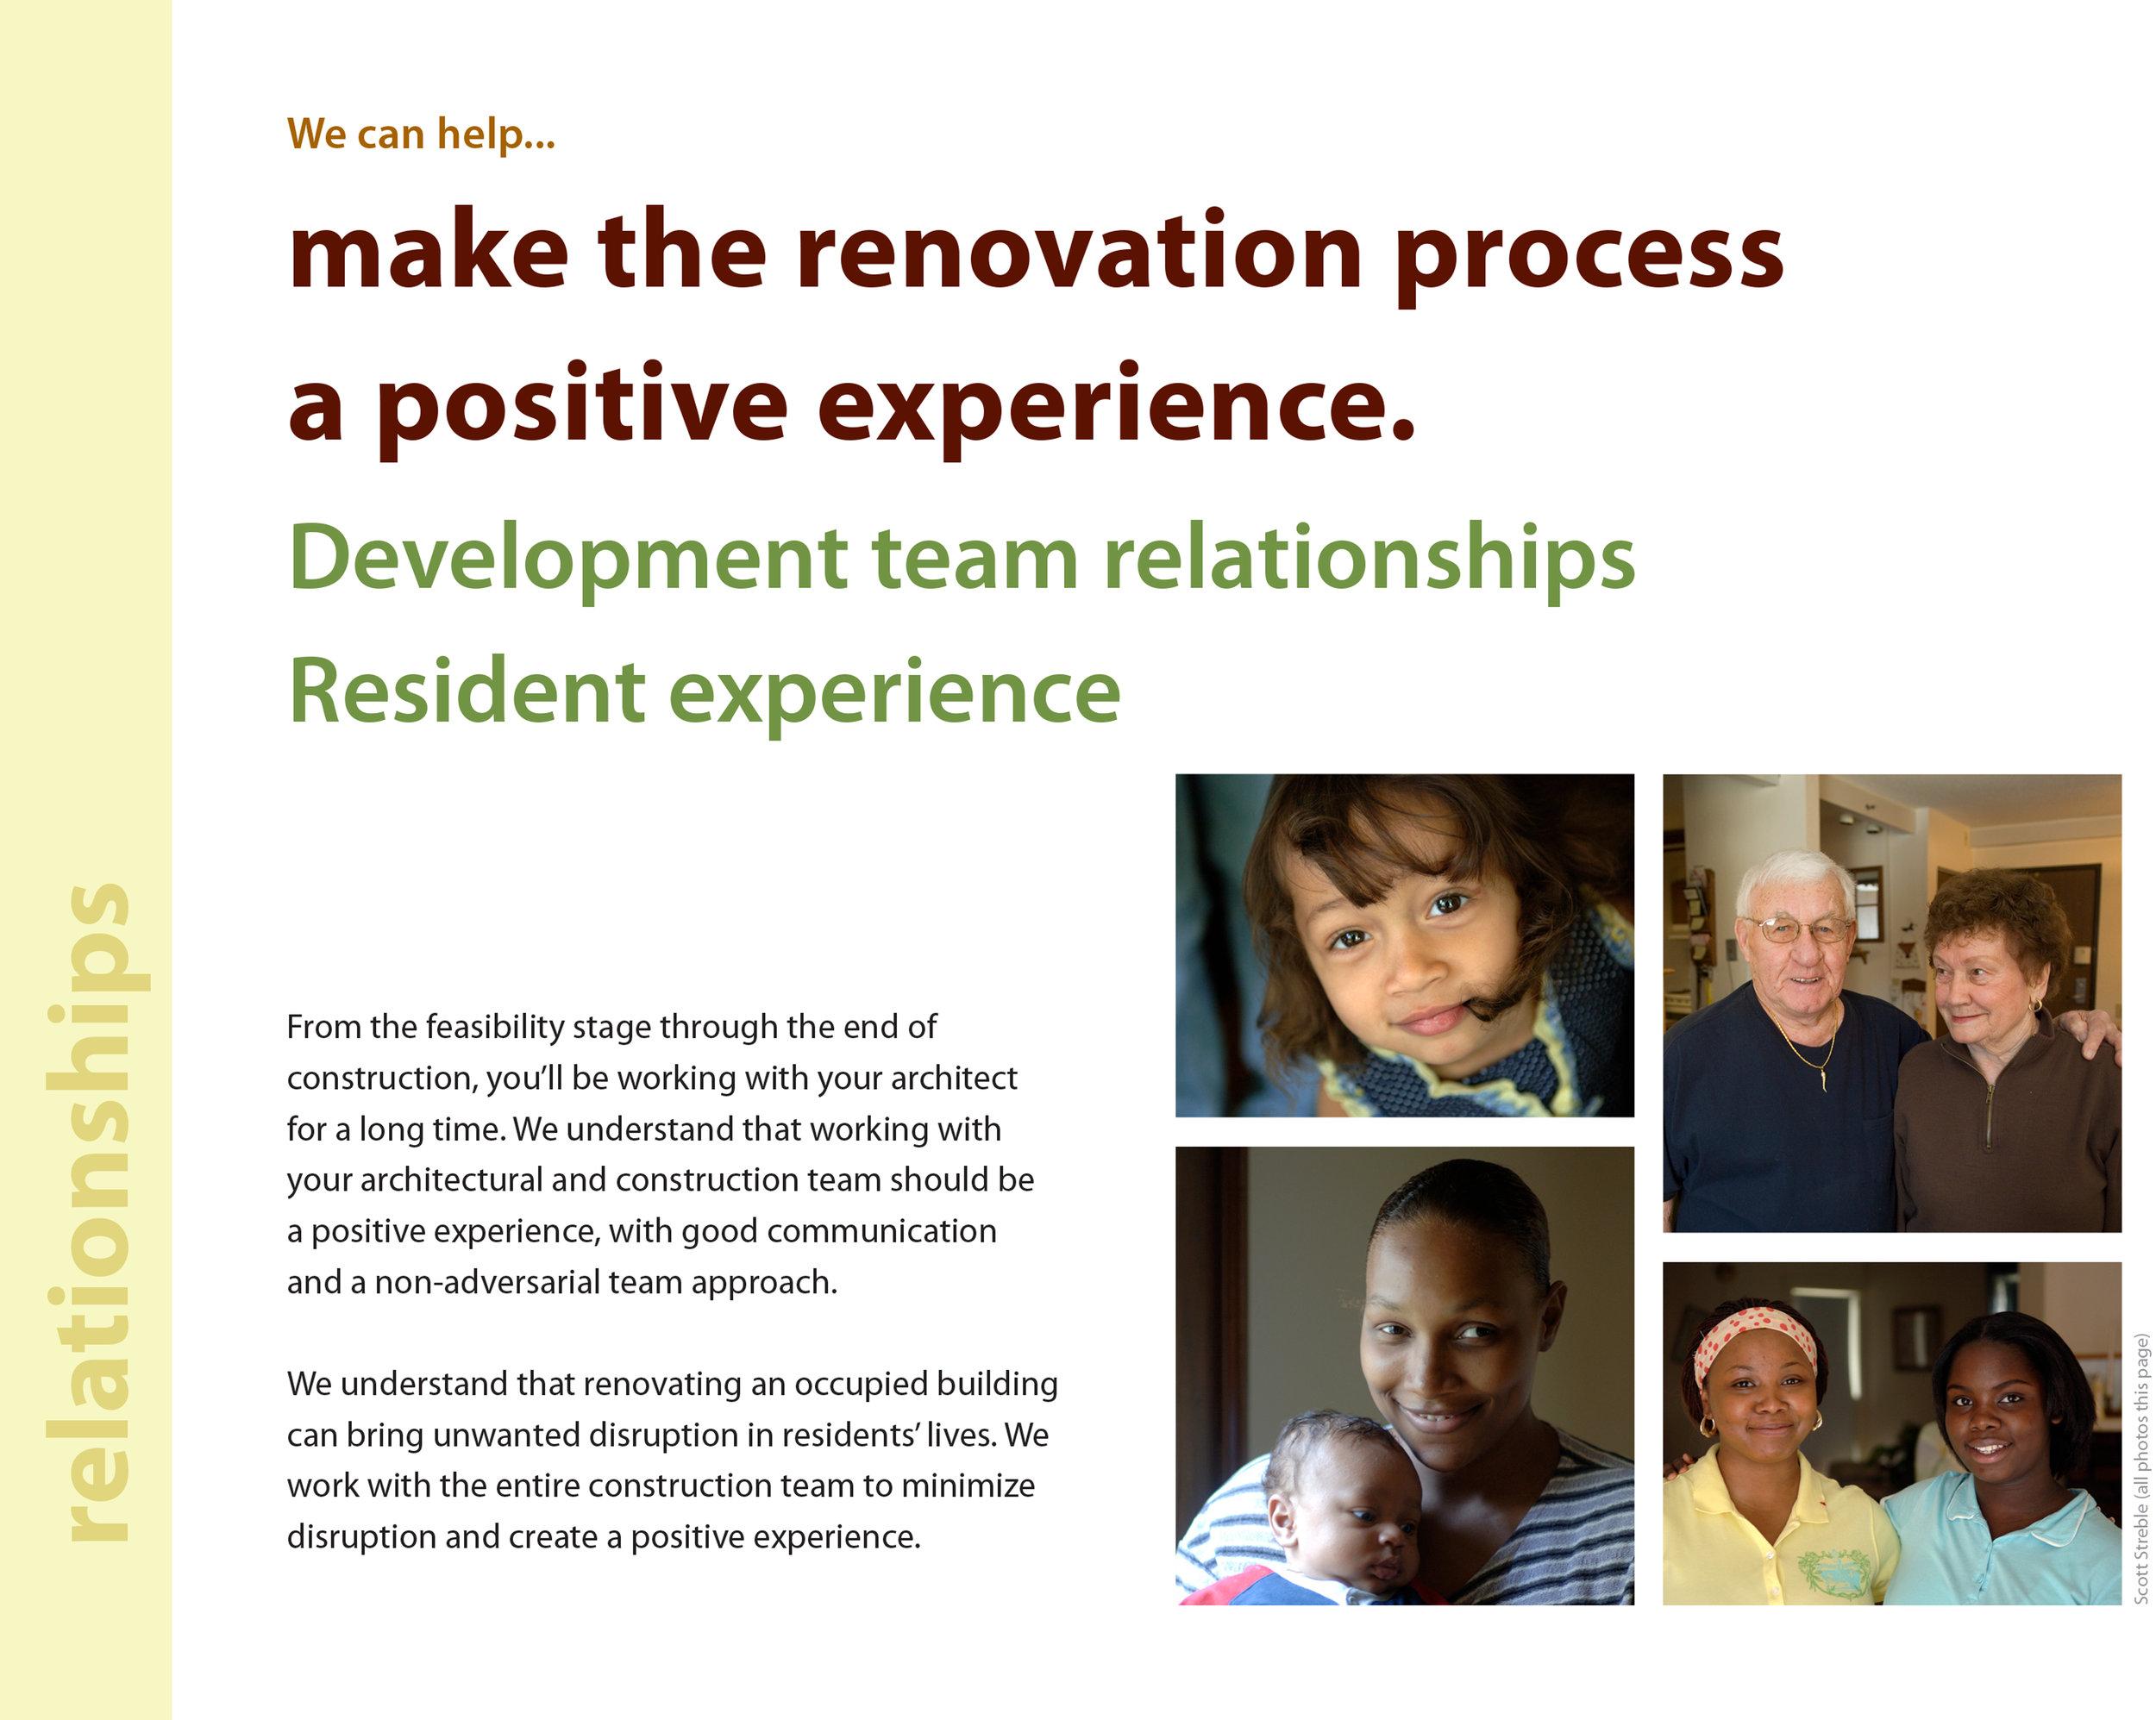 CRA-Renovation-Serv-print-version 10.jpg